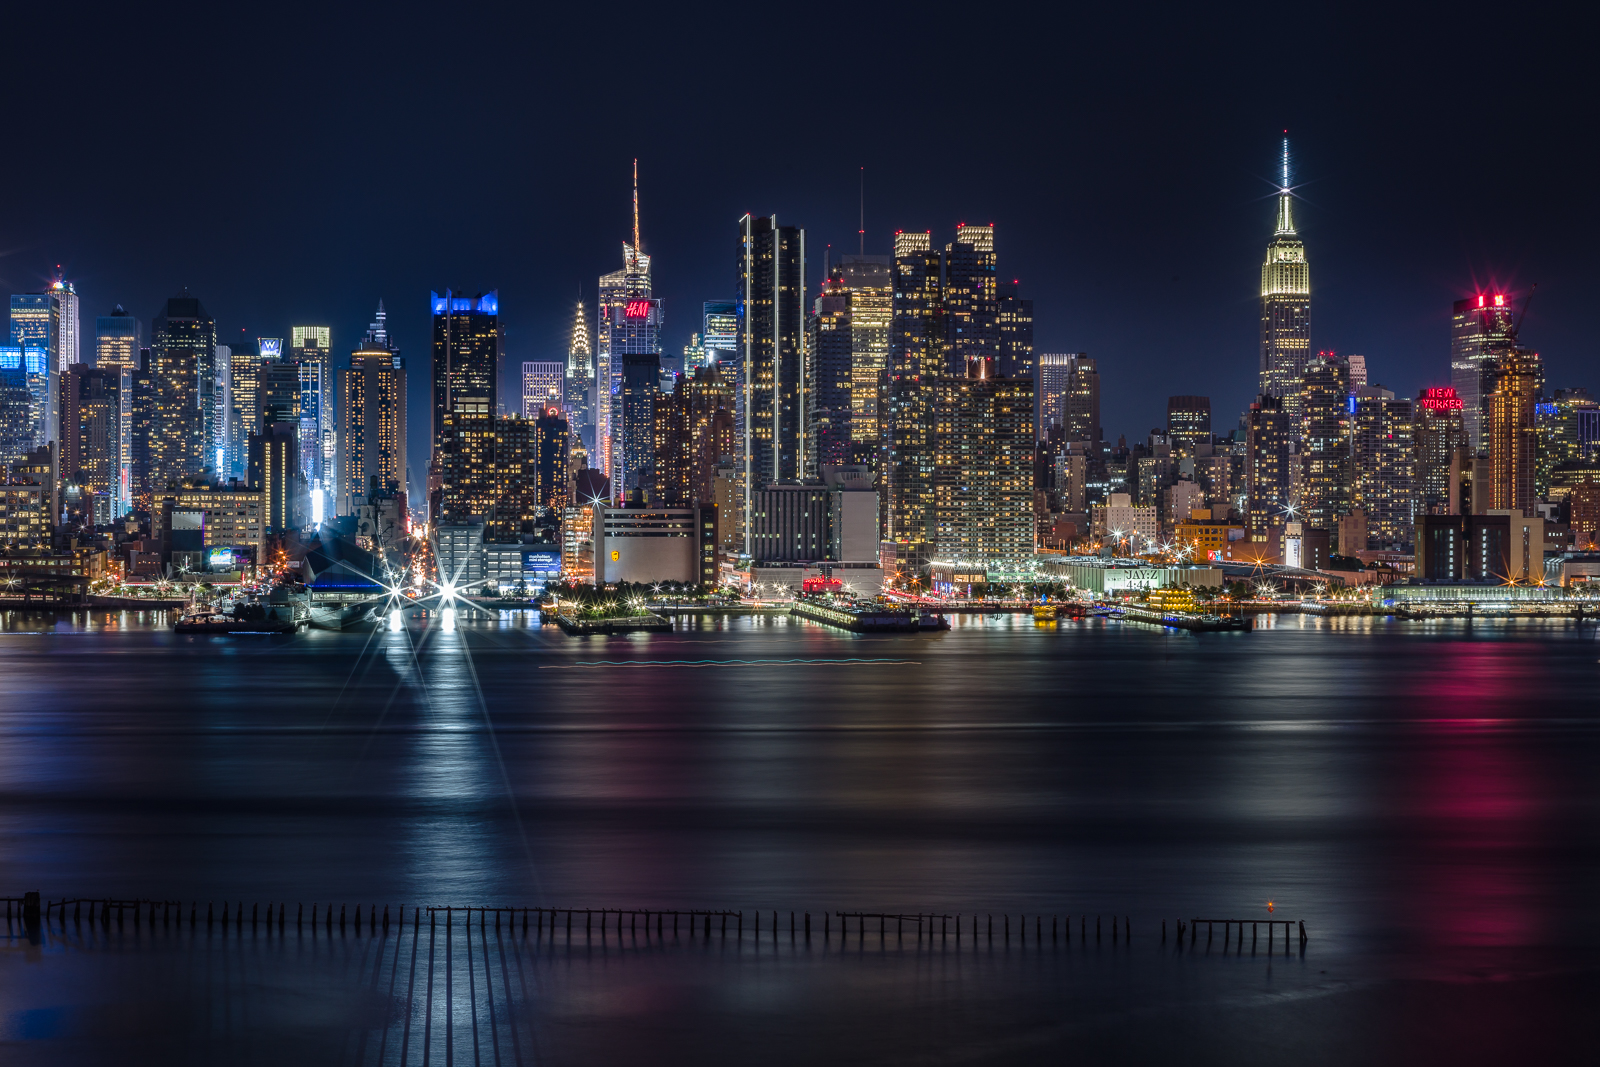 Night Lights Manhattan